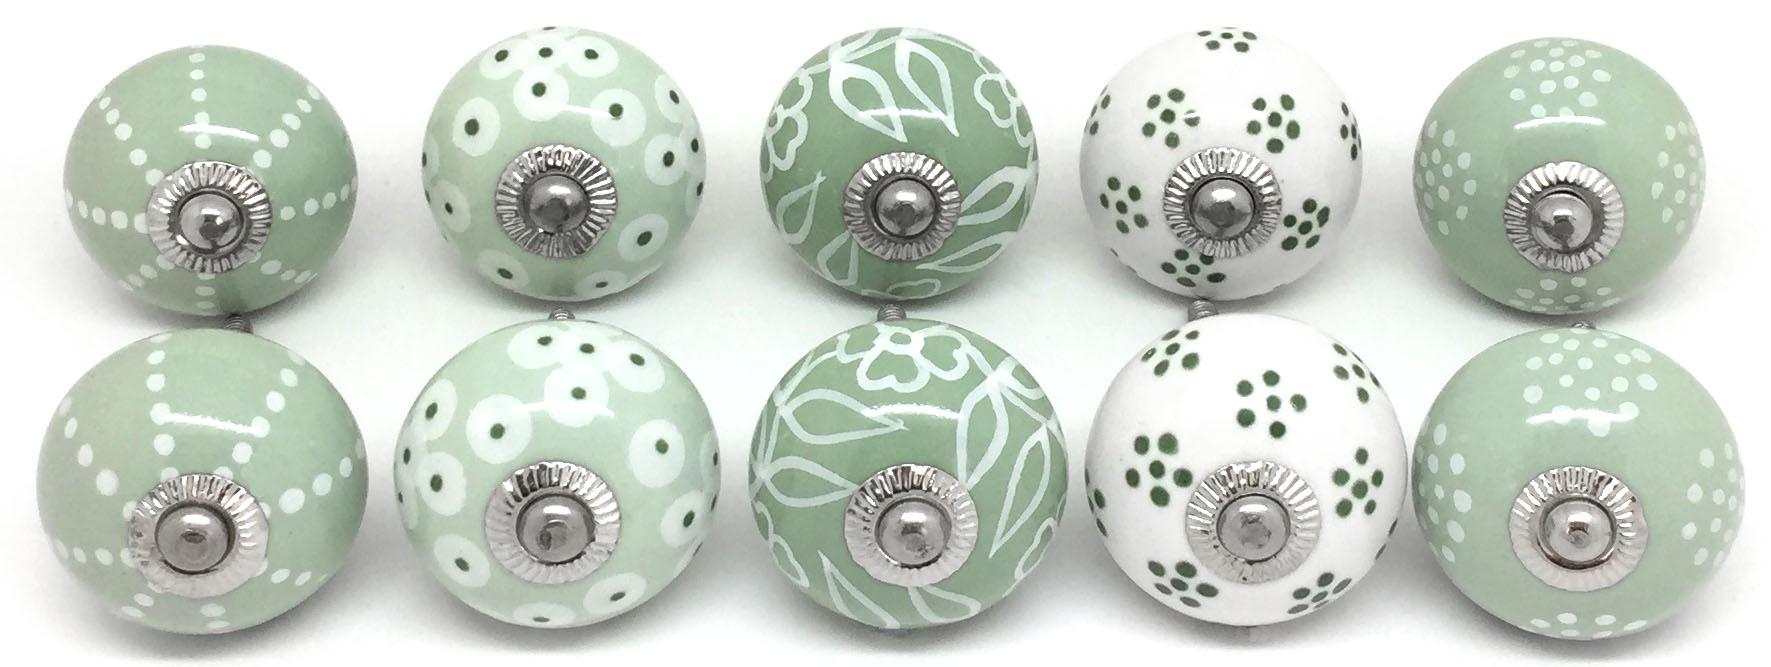 FP45 Set of 10 Mixed Green & White Door Knobs